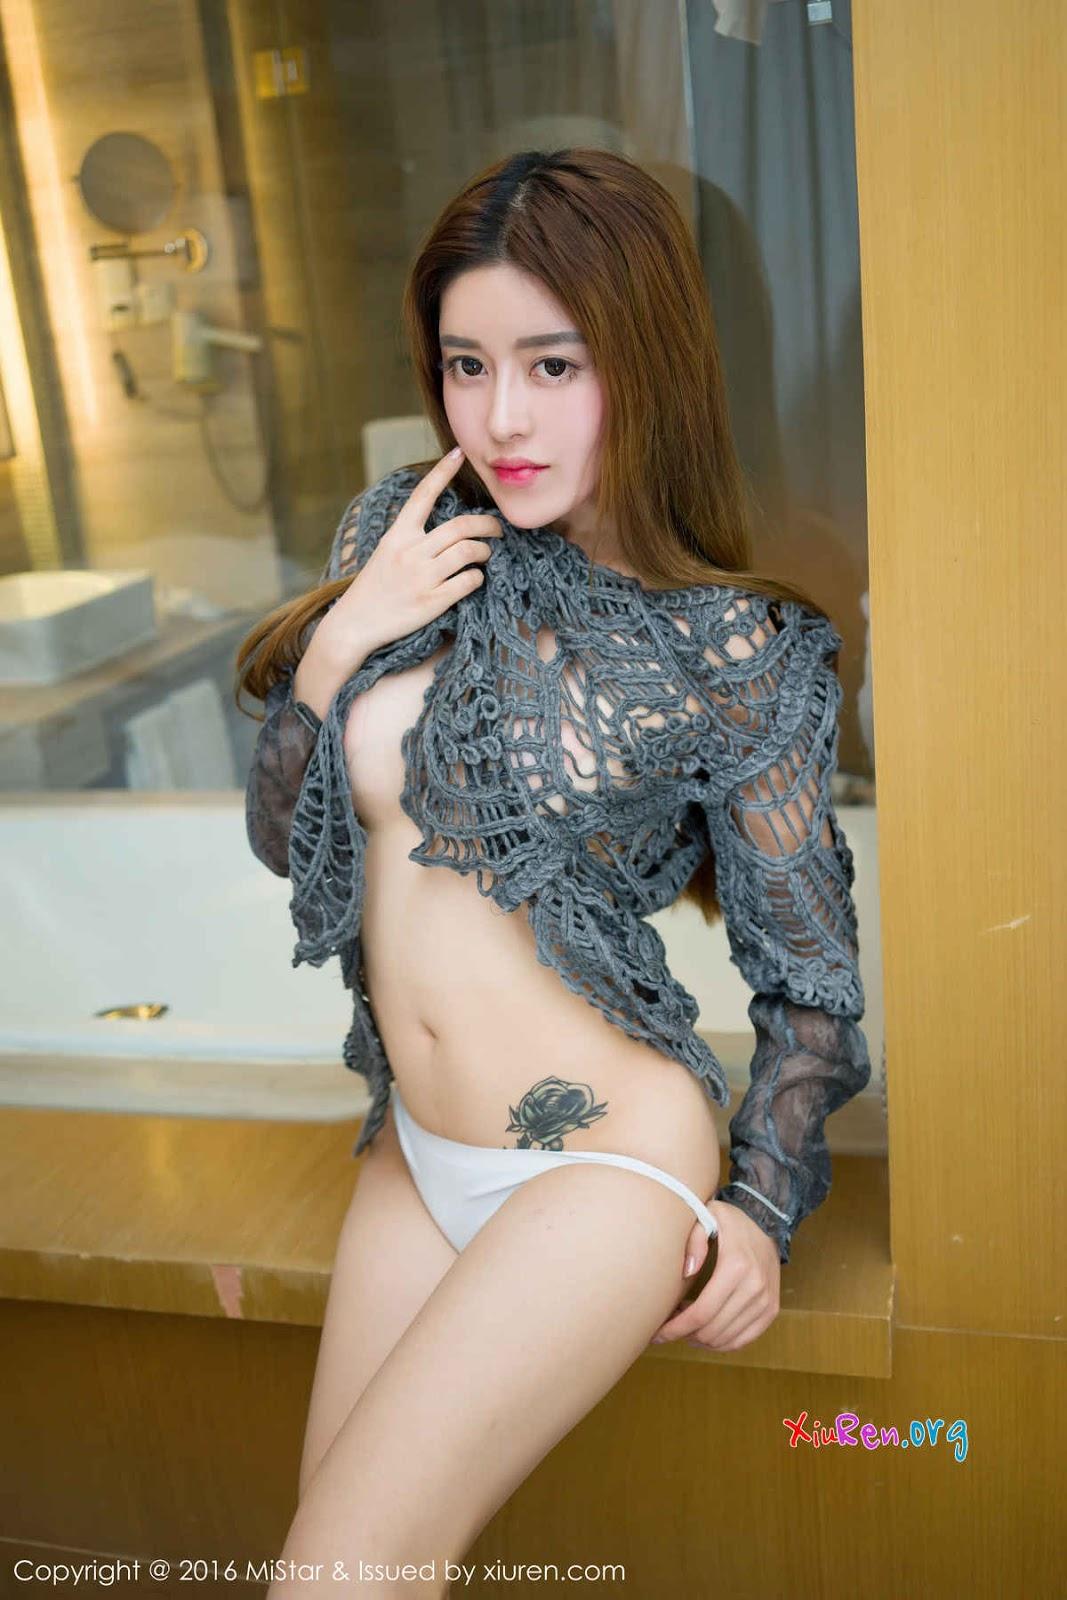 https://1.bp.blogspot.com/-57S9OBiO2SQ/WHrz83LyfLI/AAAAAAAAO1Y/rXQc3WmmxqAY7grGhfkF5dQkfOf7vkysACLcB/s1600/xinh-sexy-20.jpg